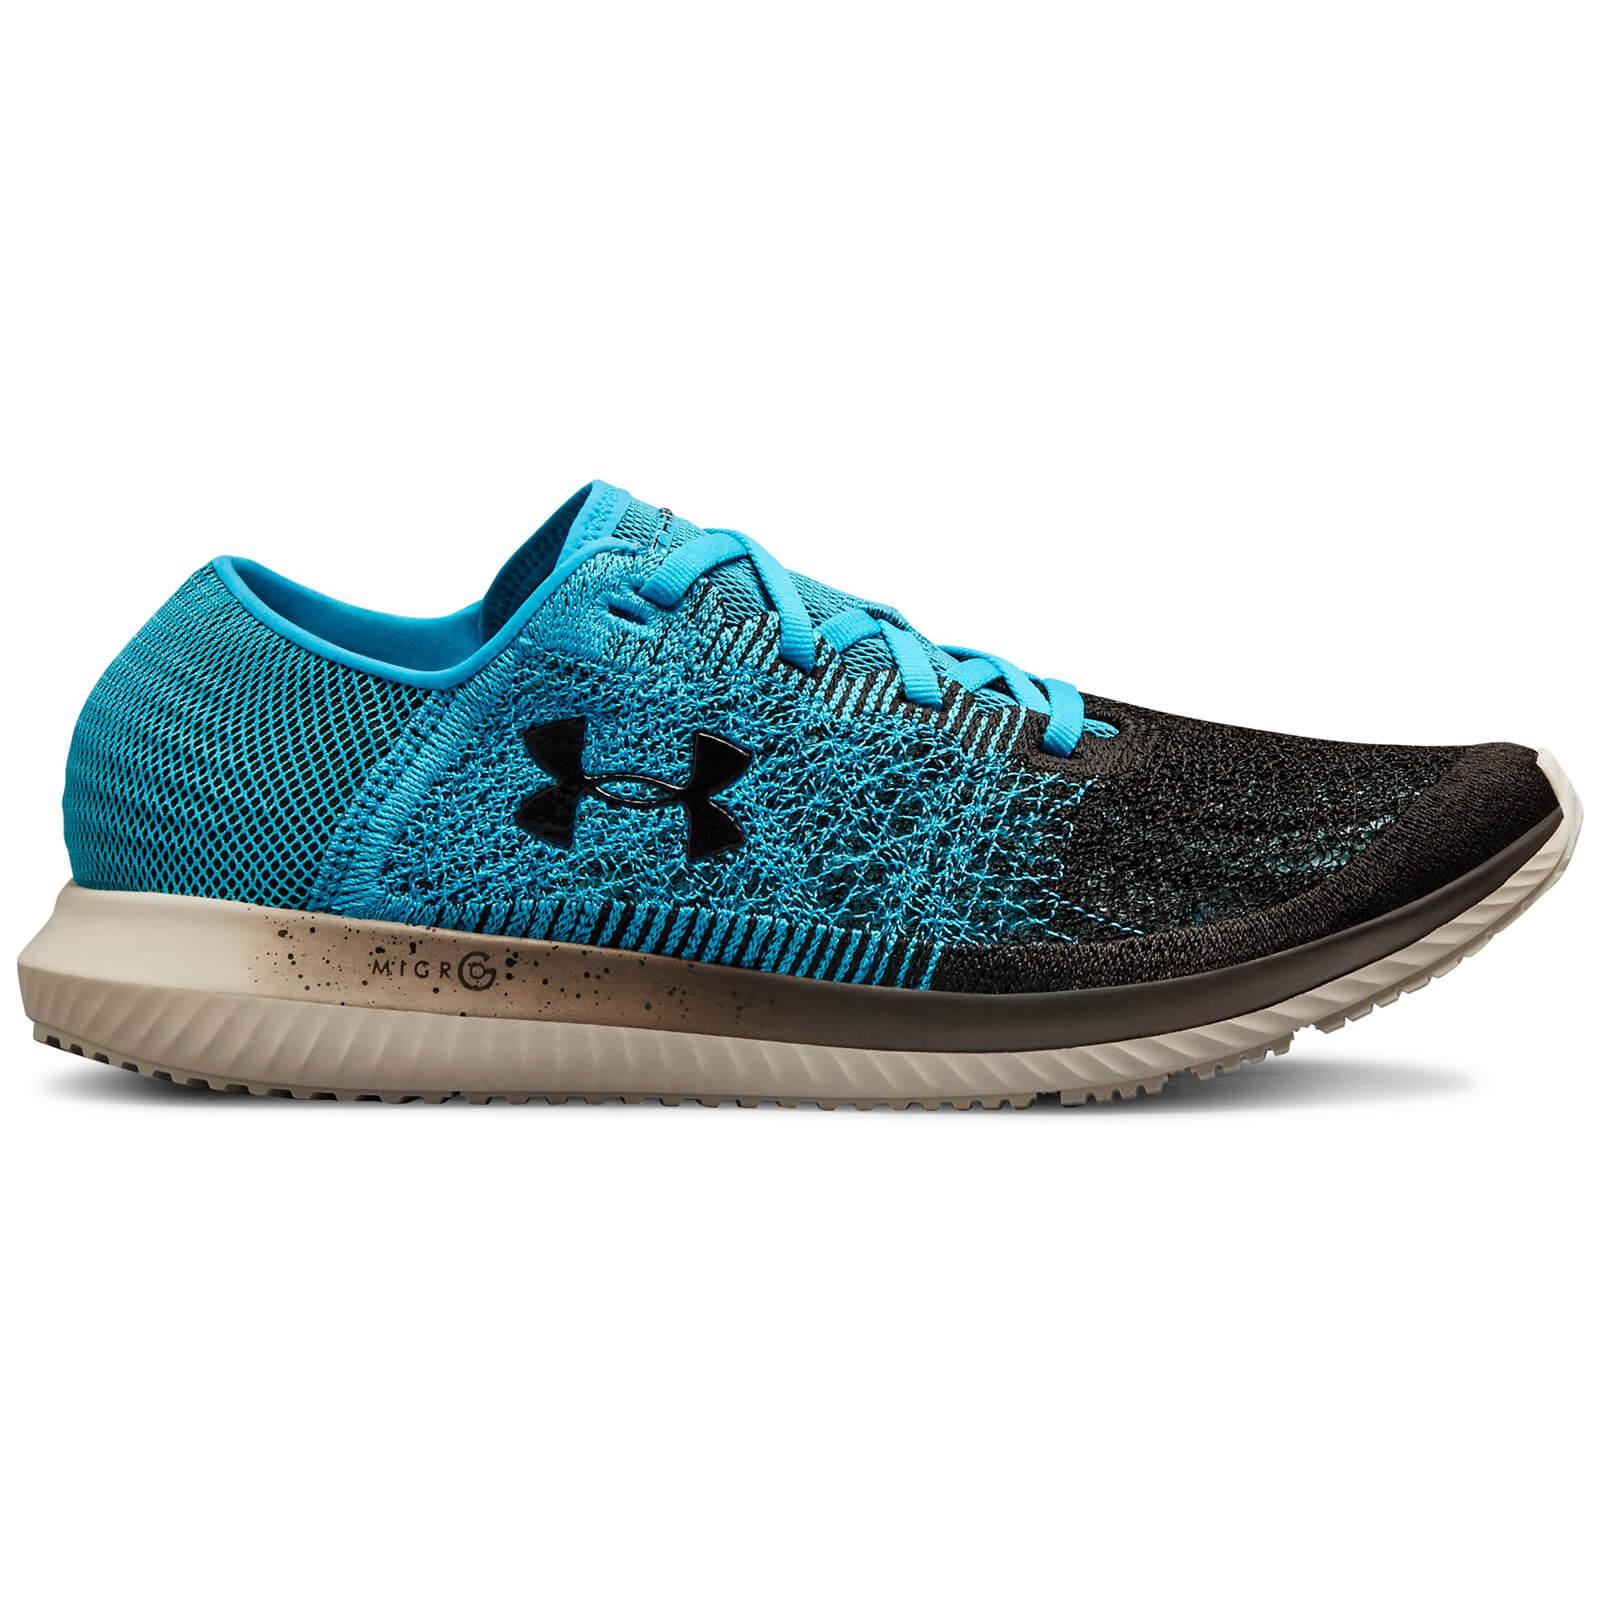 Threadborne Blur Running Shoes - Blue